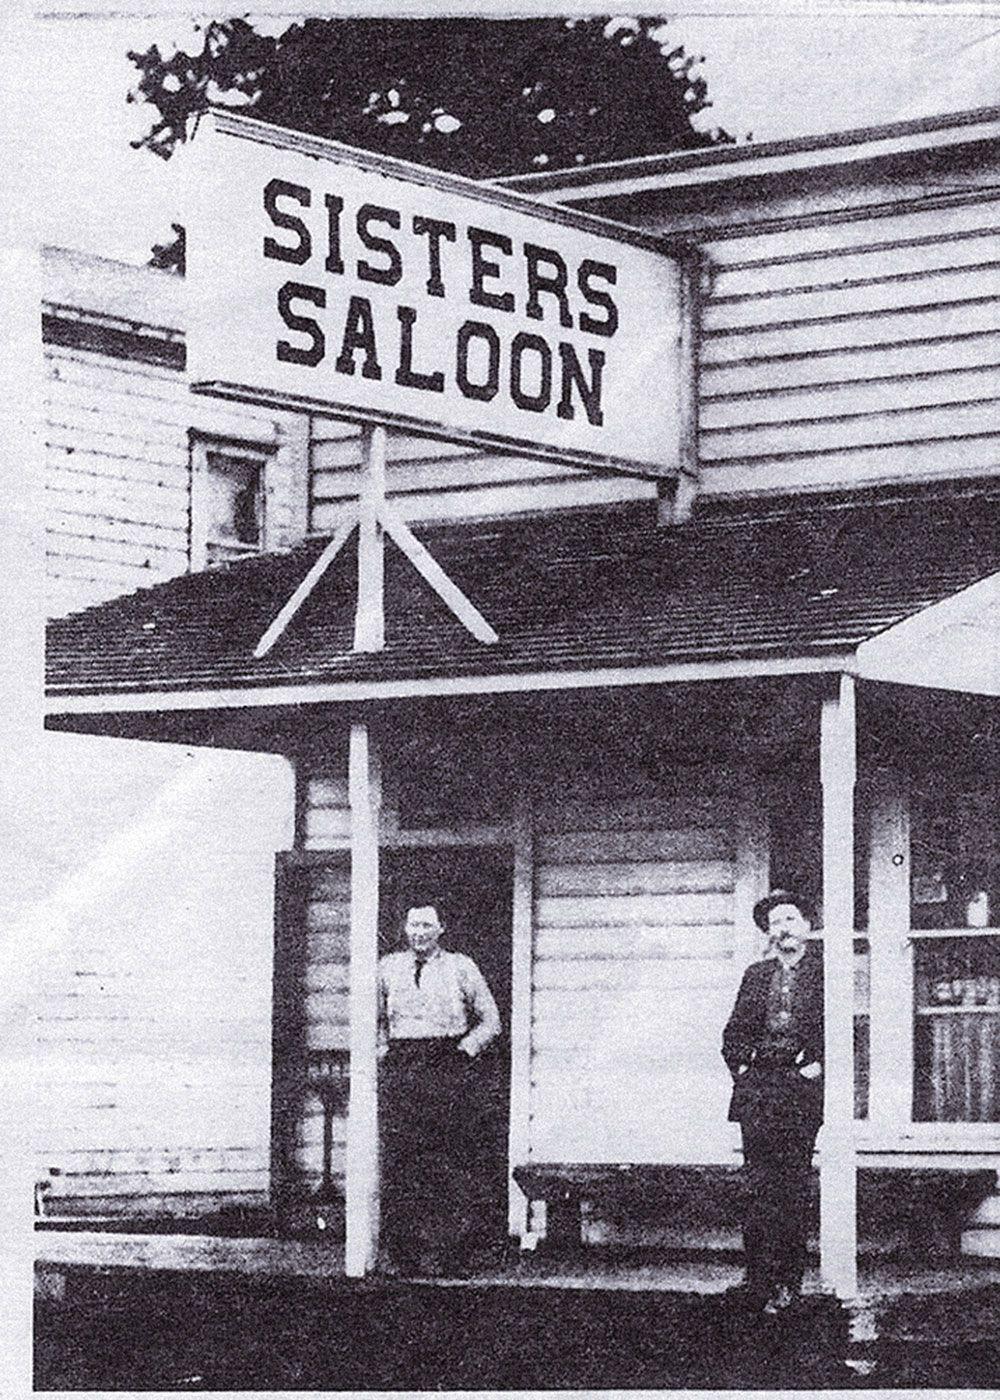 sisters saloon sisters oregon true west magazine